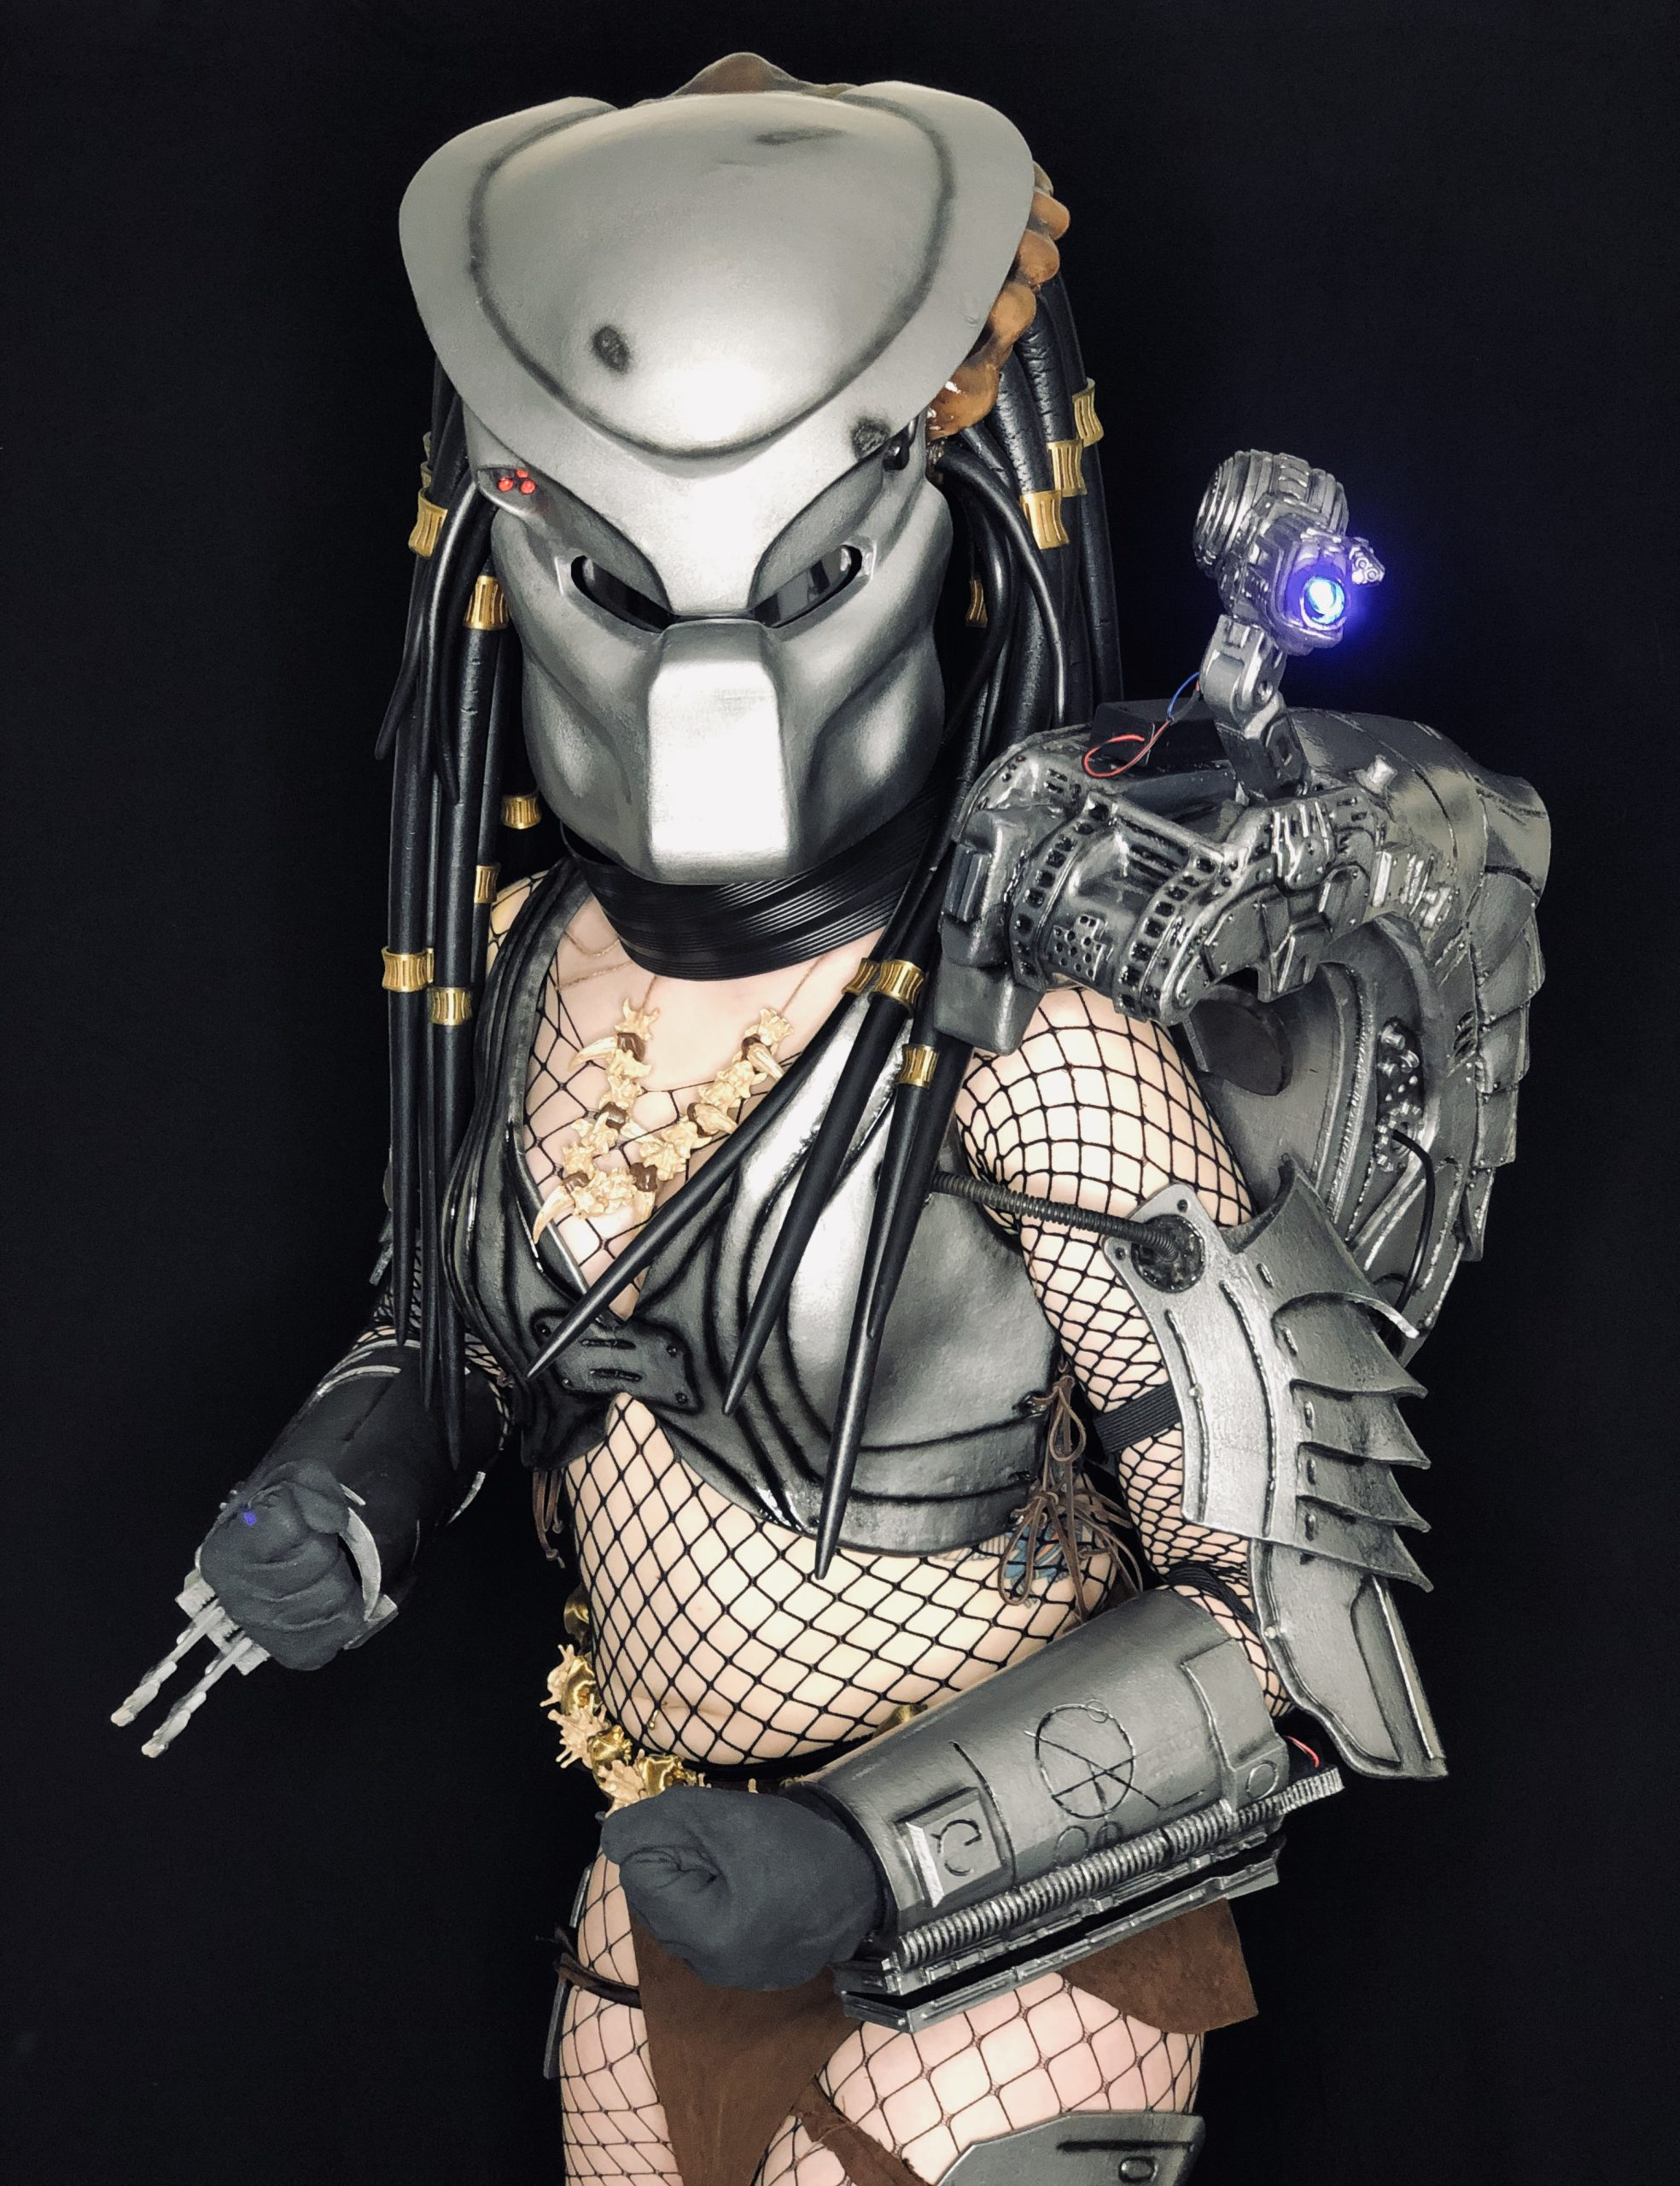 Glamazon_Painforest_Cosplay -Female Predator